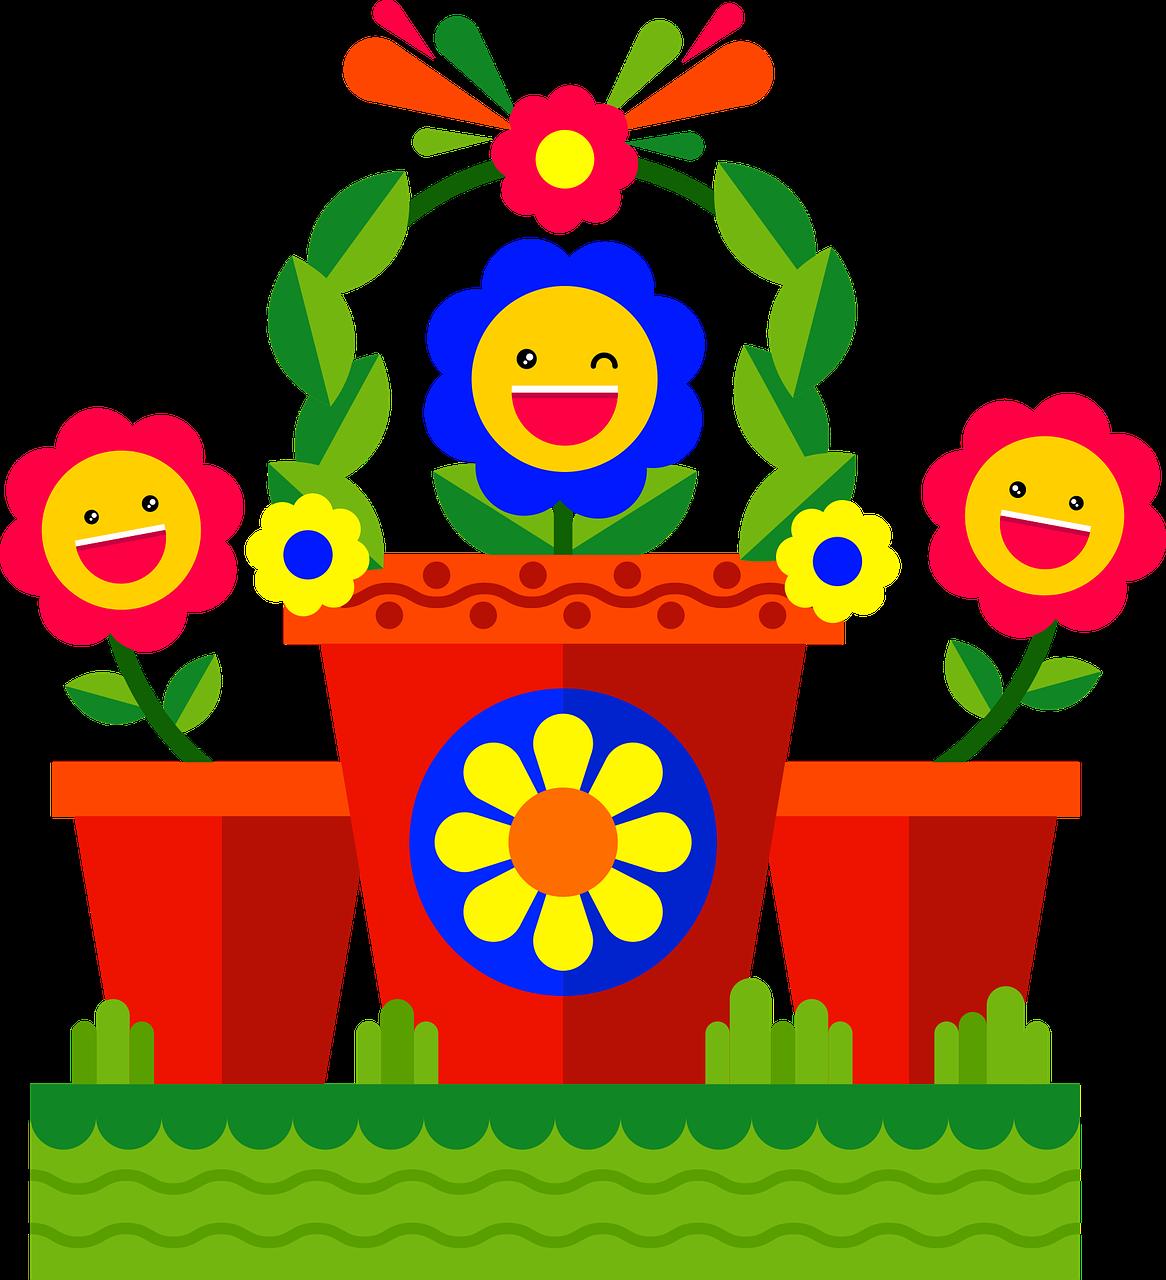 Emojiflowersgardennaturespring Free Photo From Needpixcom